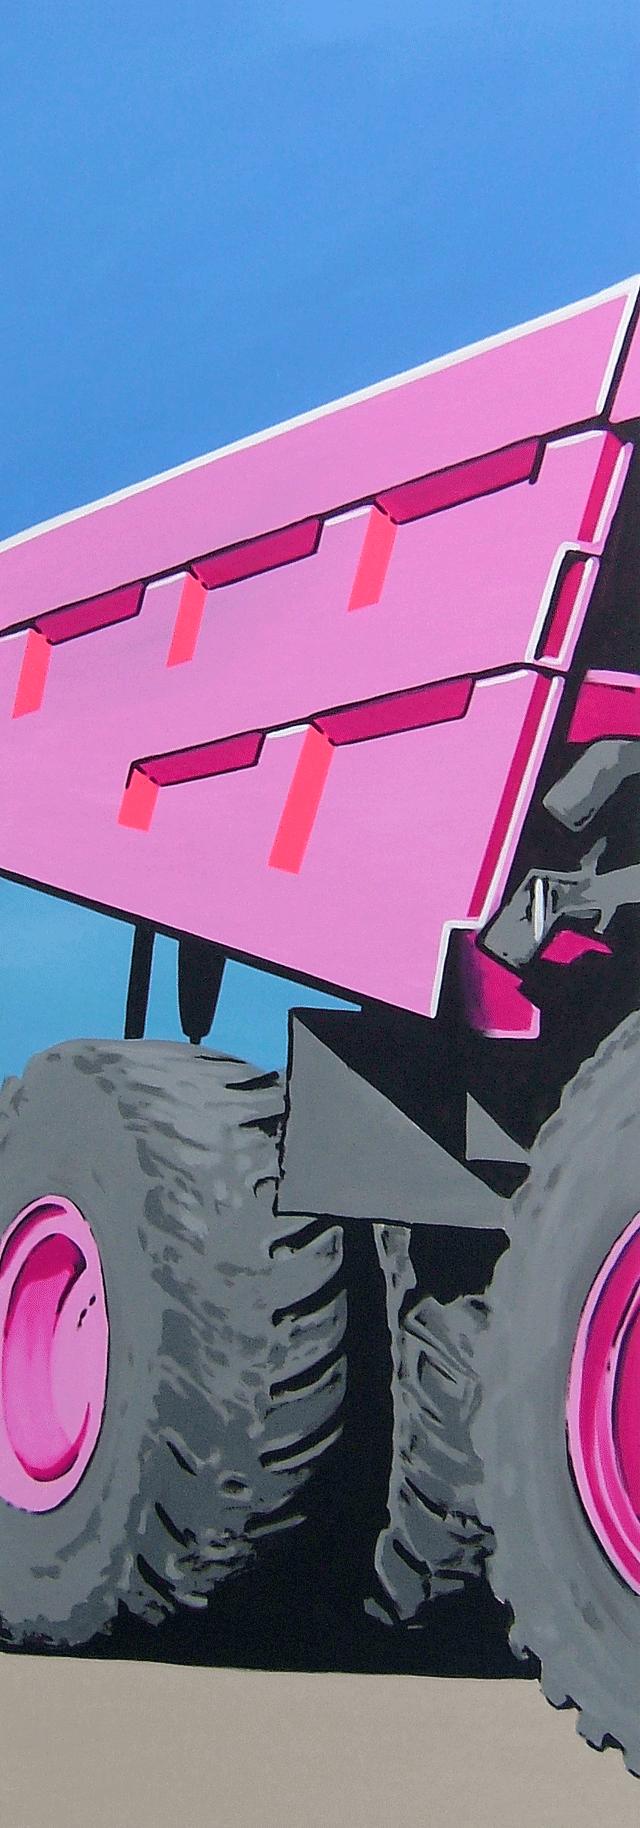 Pink Cat | 2005 | Acryl auf Leinwand | 200 x 70 cm